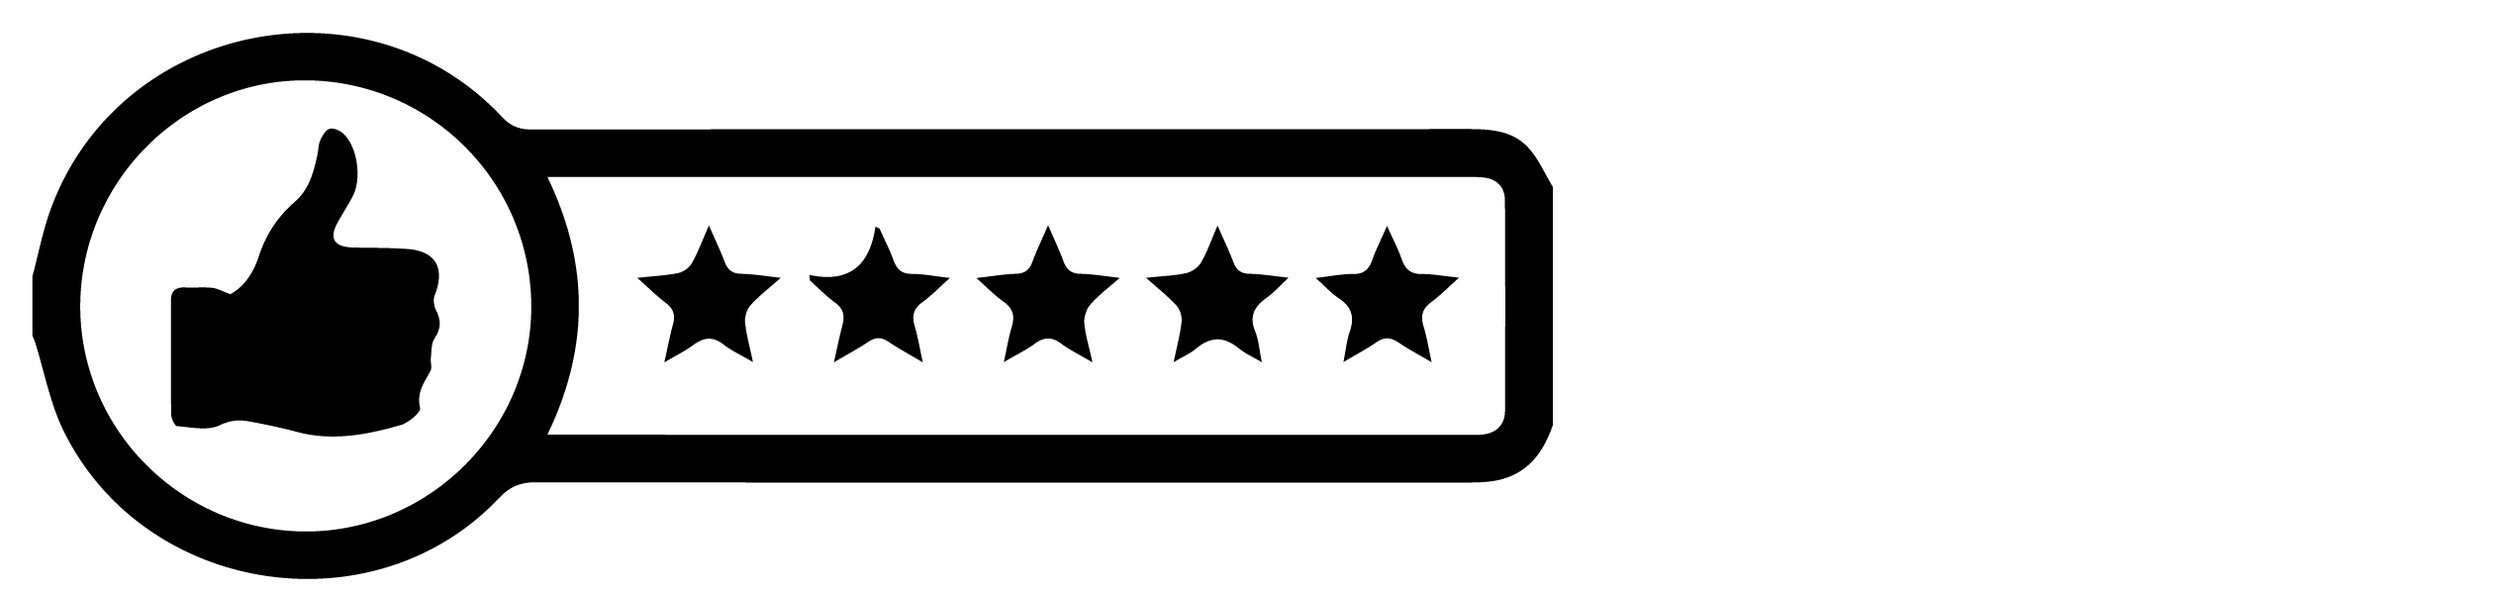 five star review@3x-100.jpg